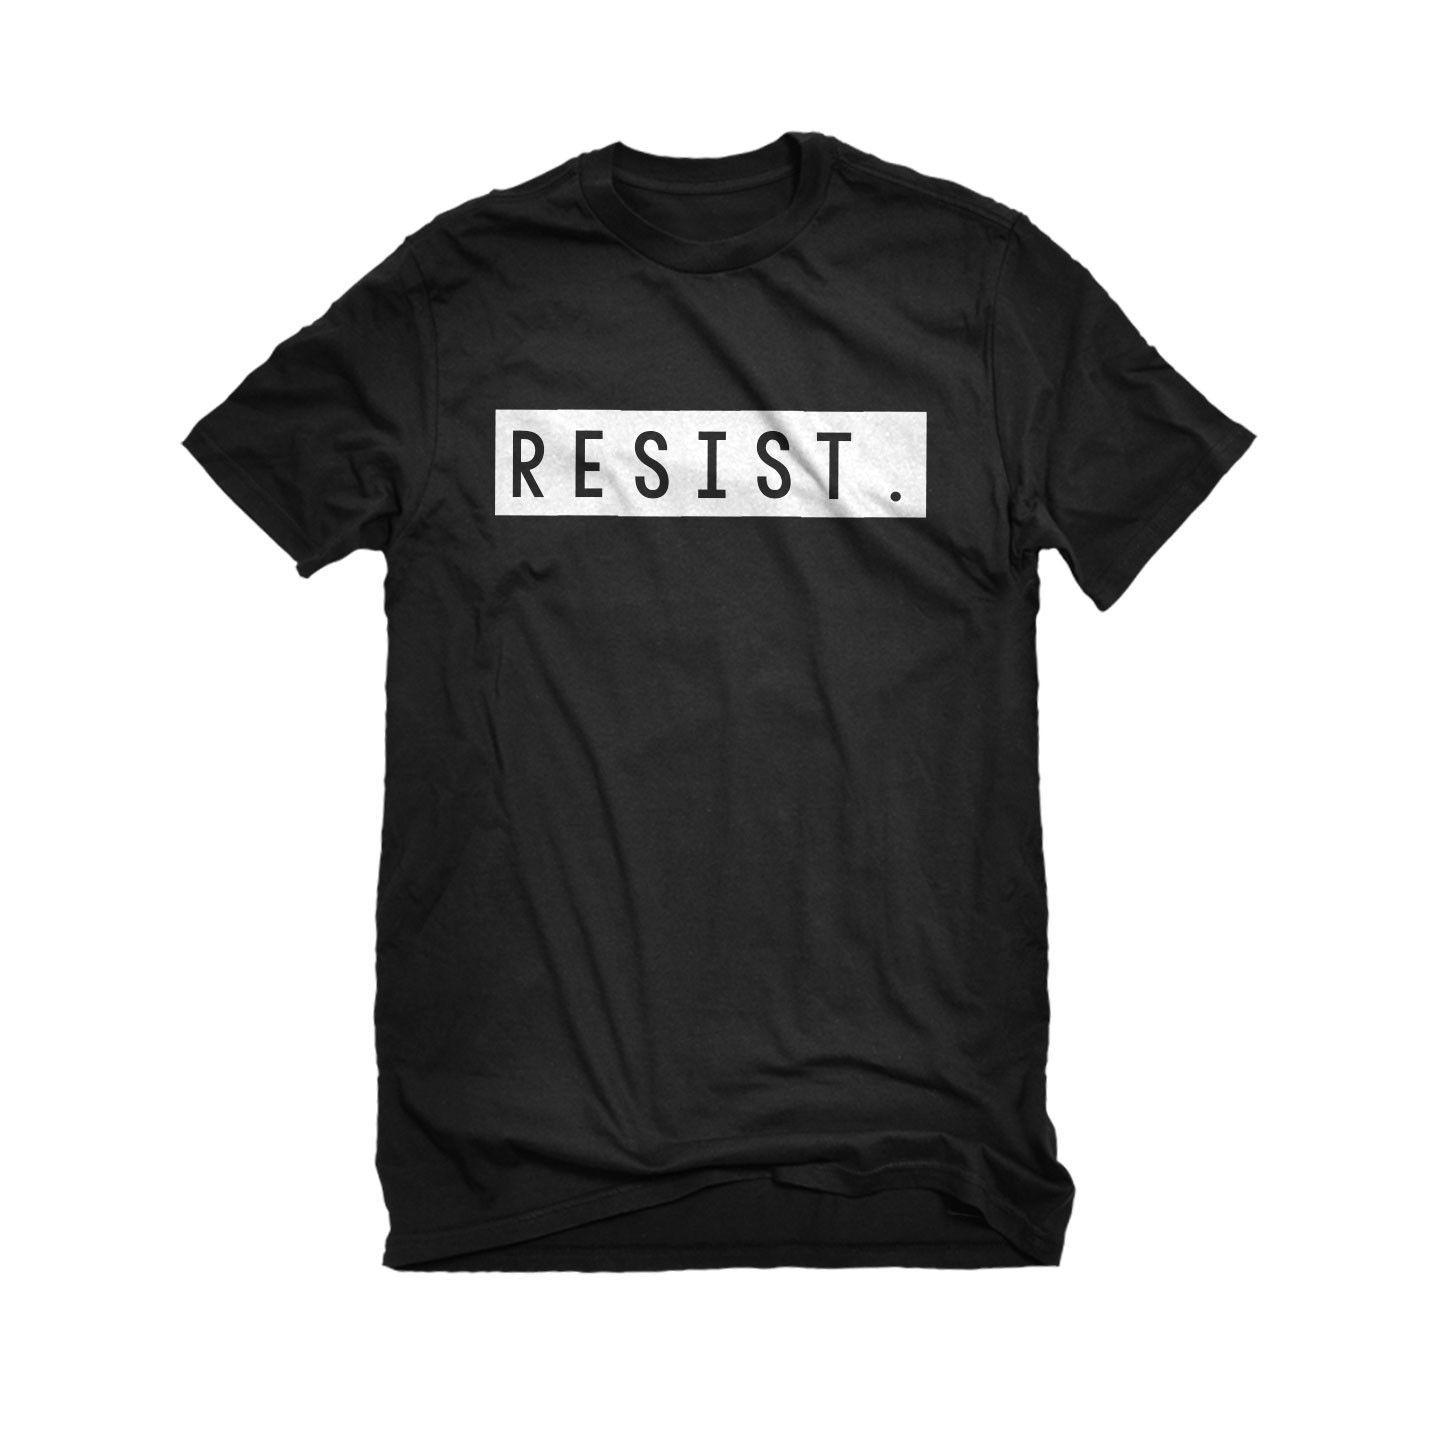 Resist Mens Unisex T-shirt